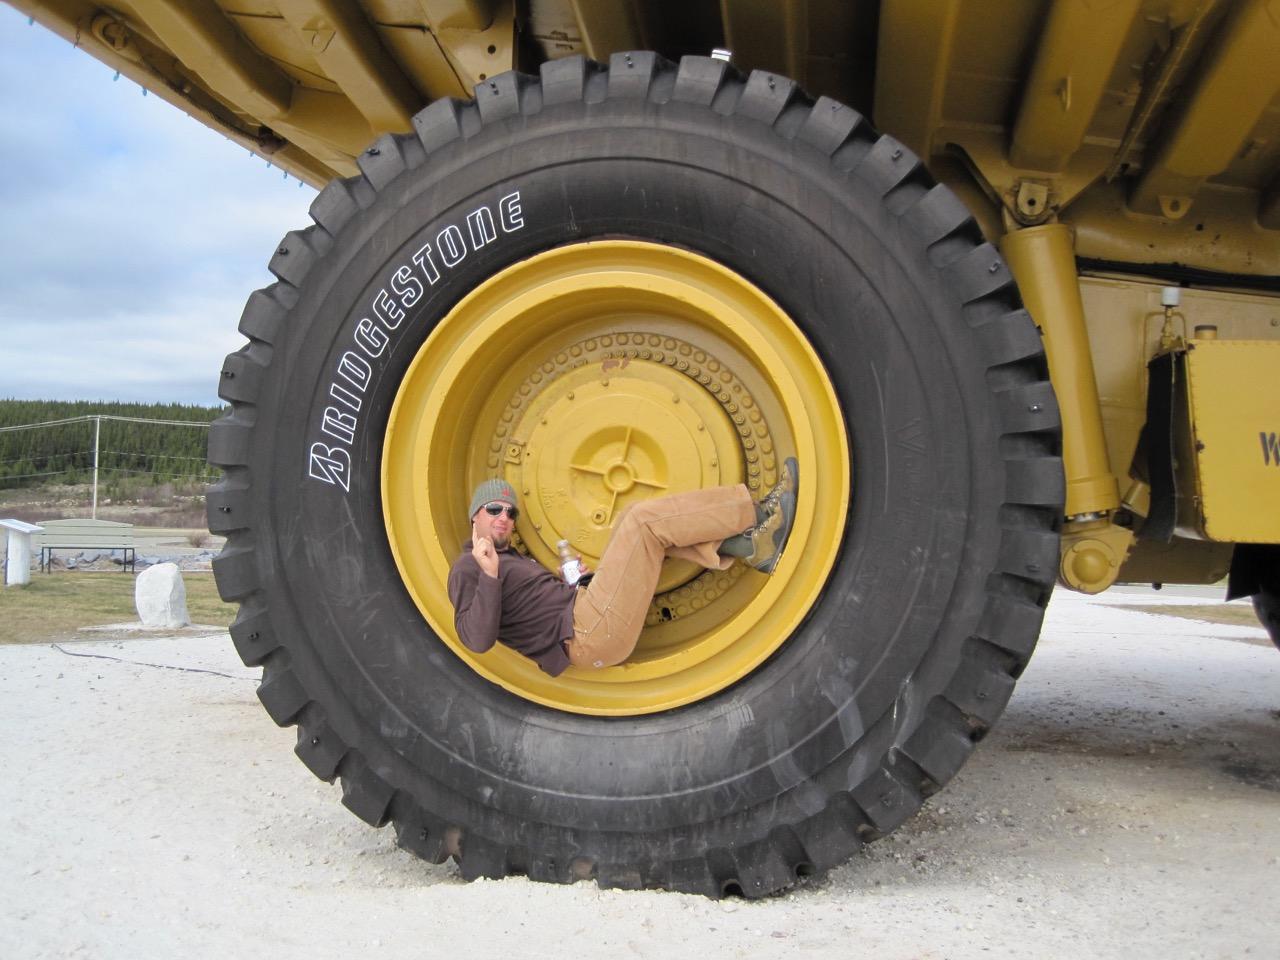 A Giant Dump Truck in Fermont, Quebec